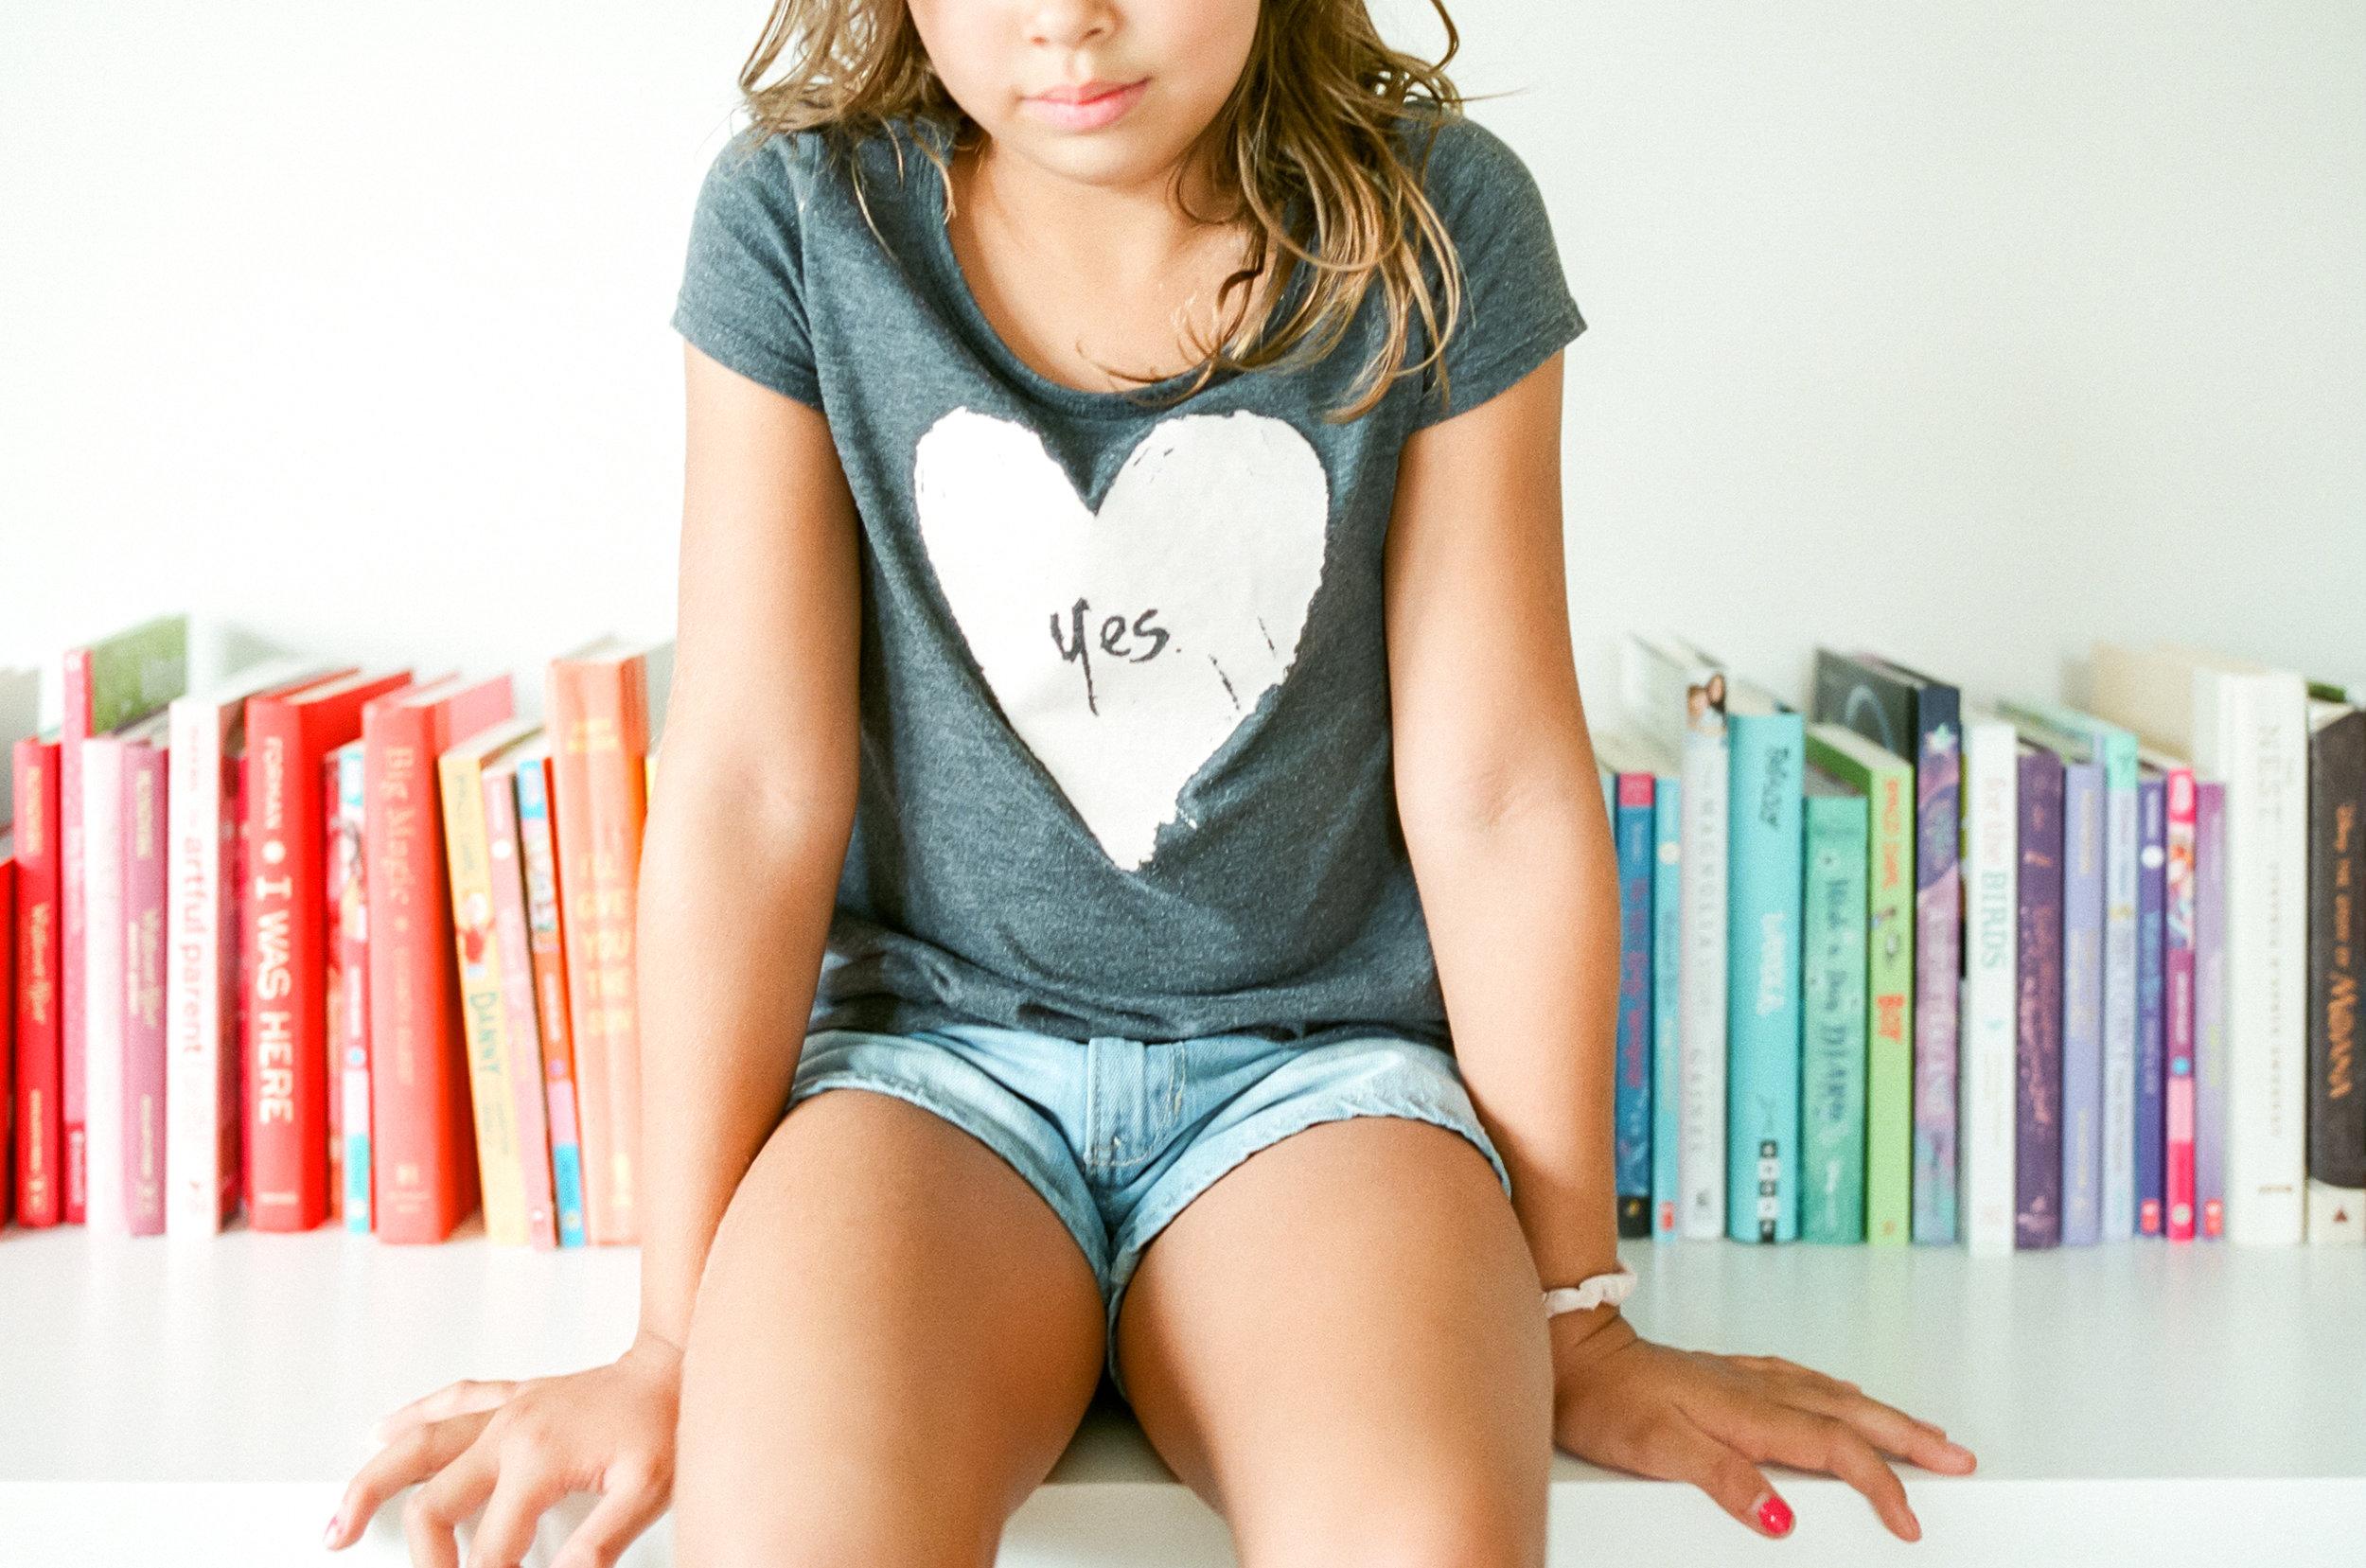 raleigh-film-photographer-rainbow-books-yes-shirt